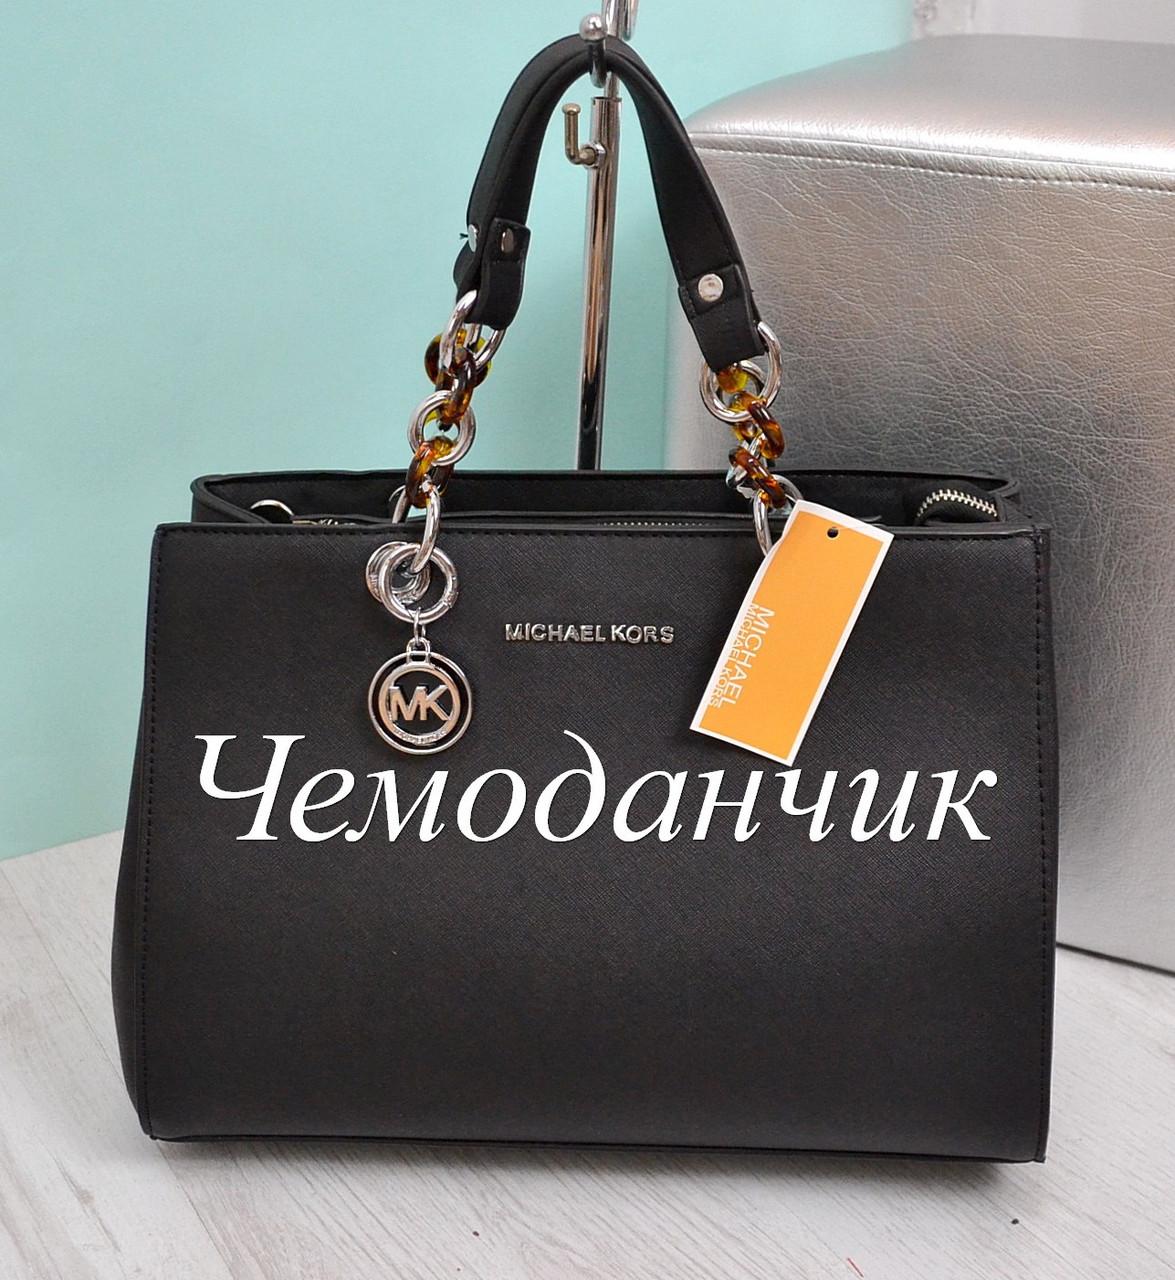 bf02a04a918c Сумочка Майкл Корс (4) в расцветках: продажа, цена в Одессе. женские ...